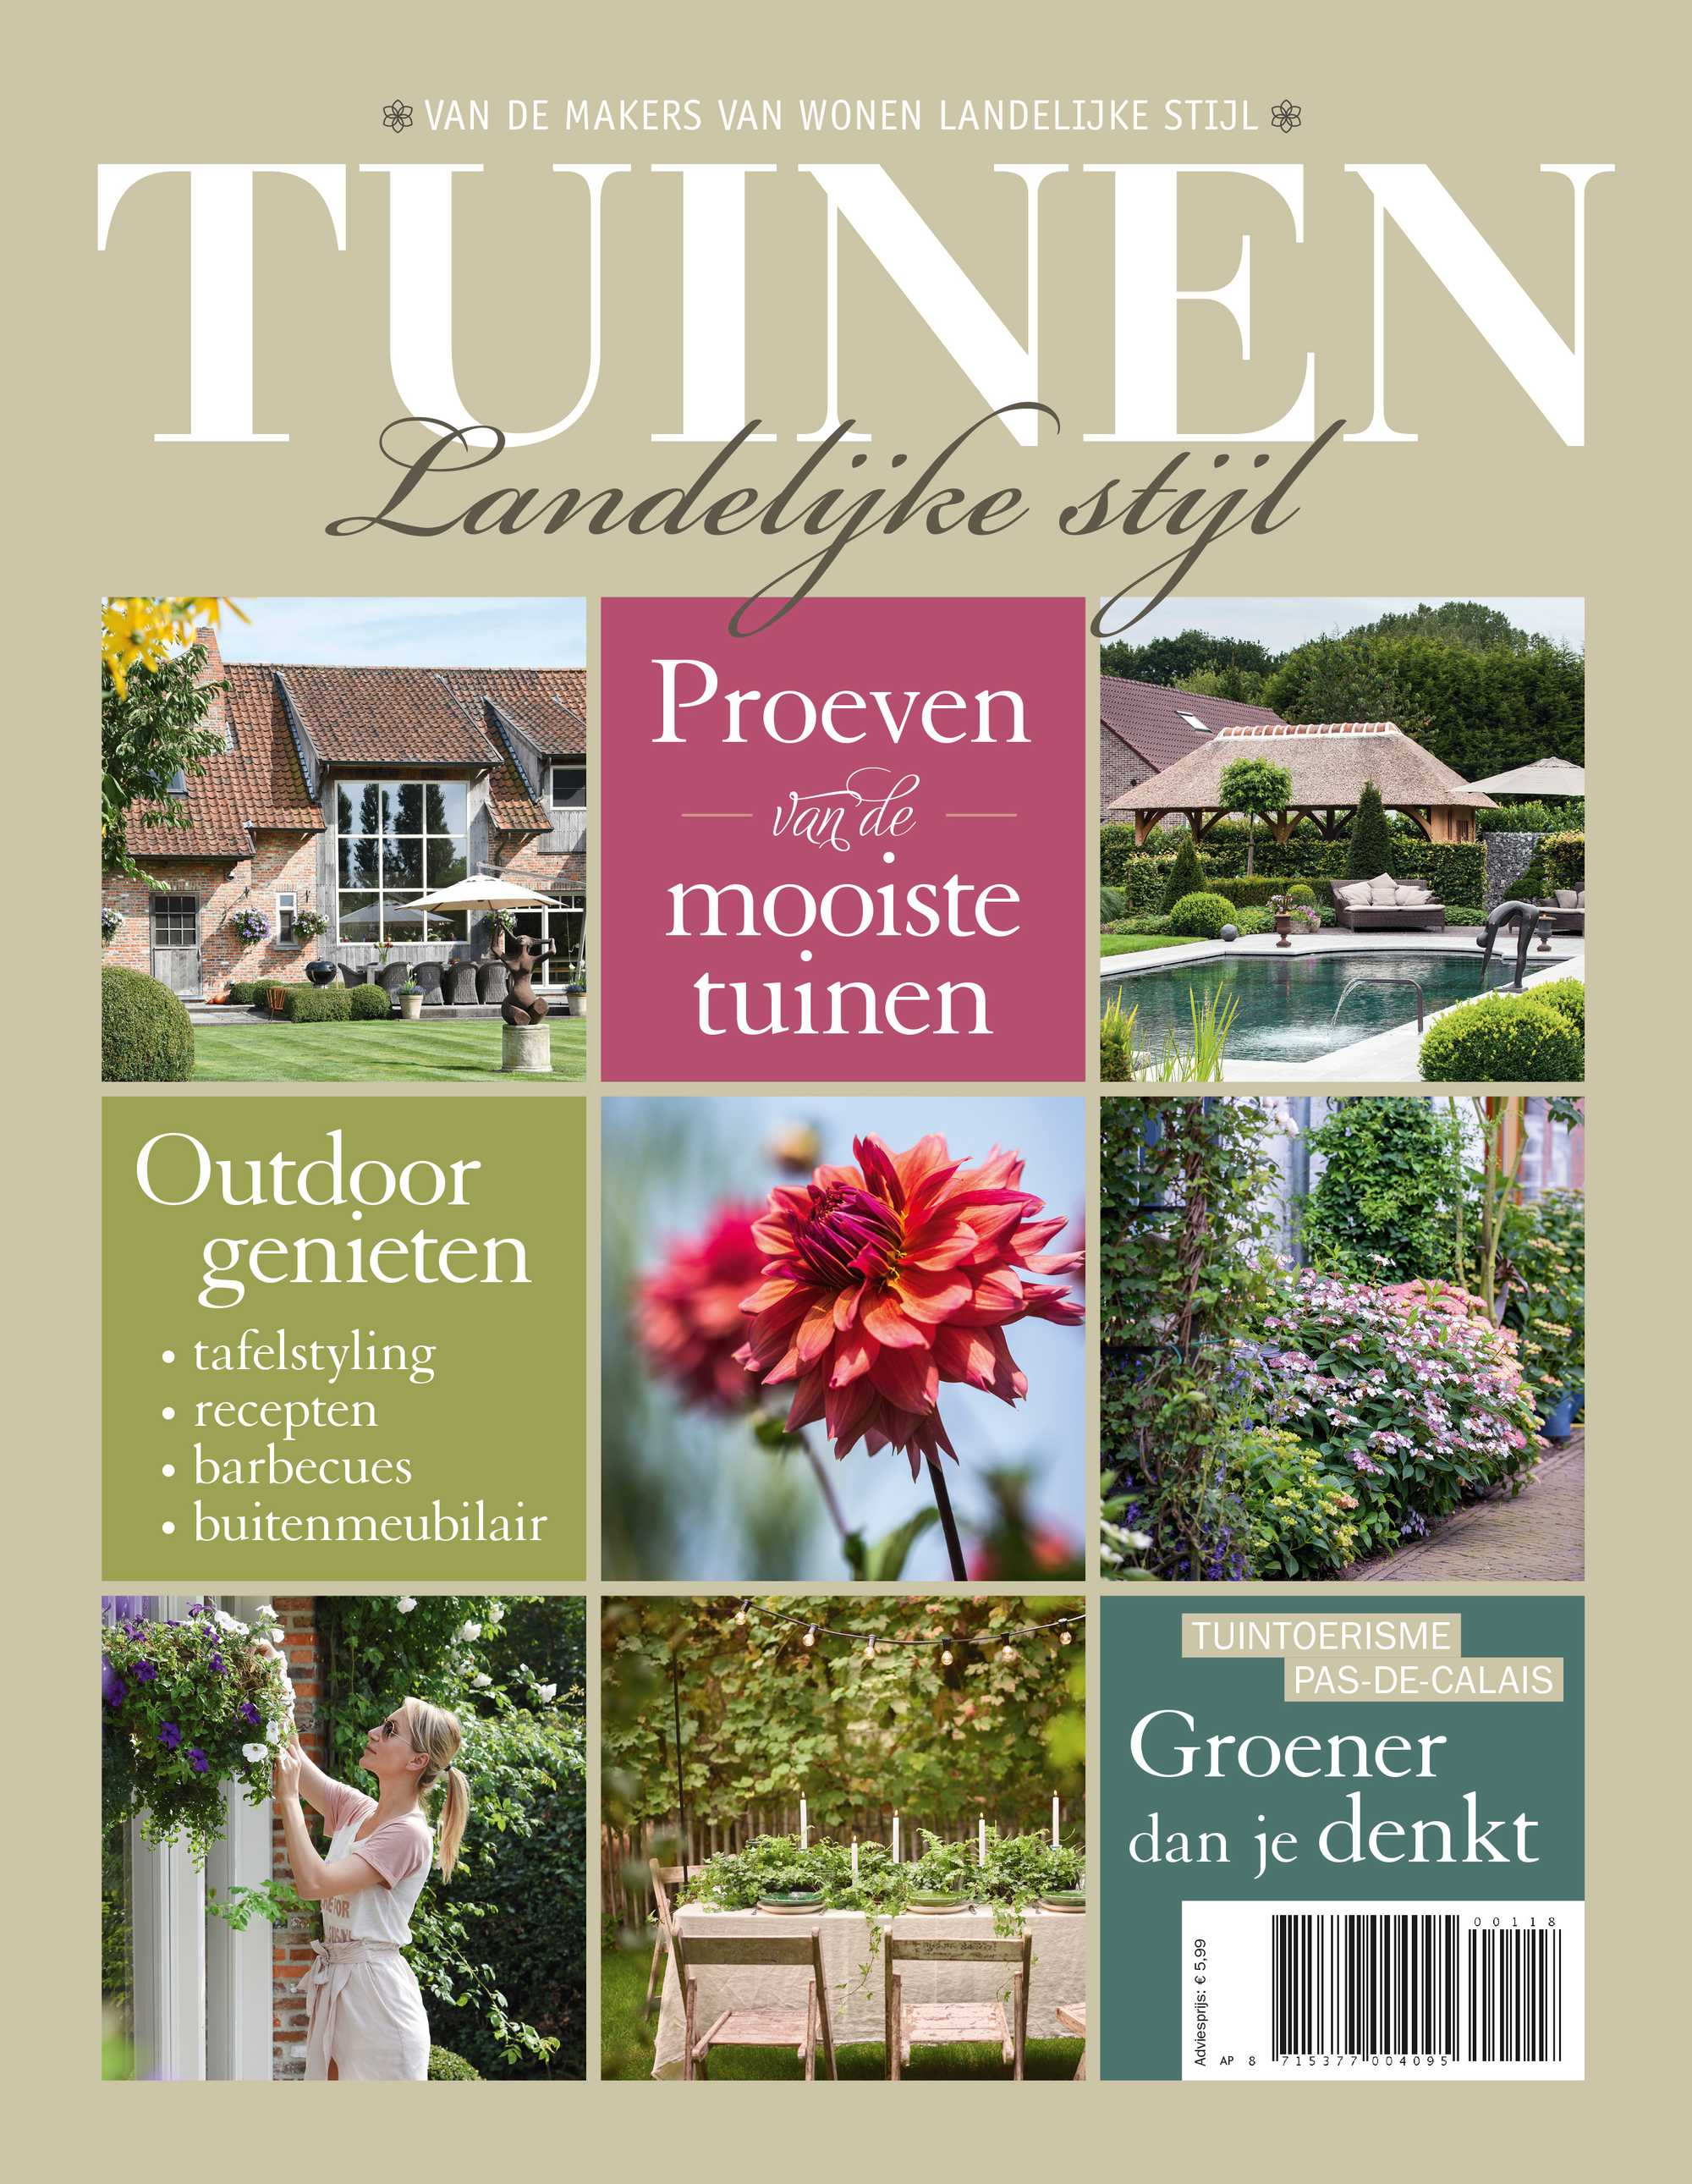 tuinen landelijke stijl 0118 cover NL